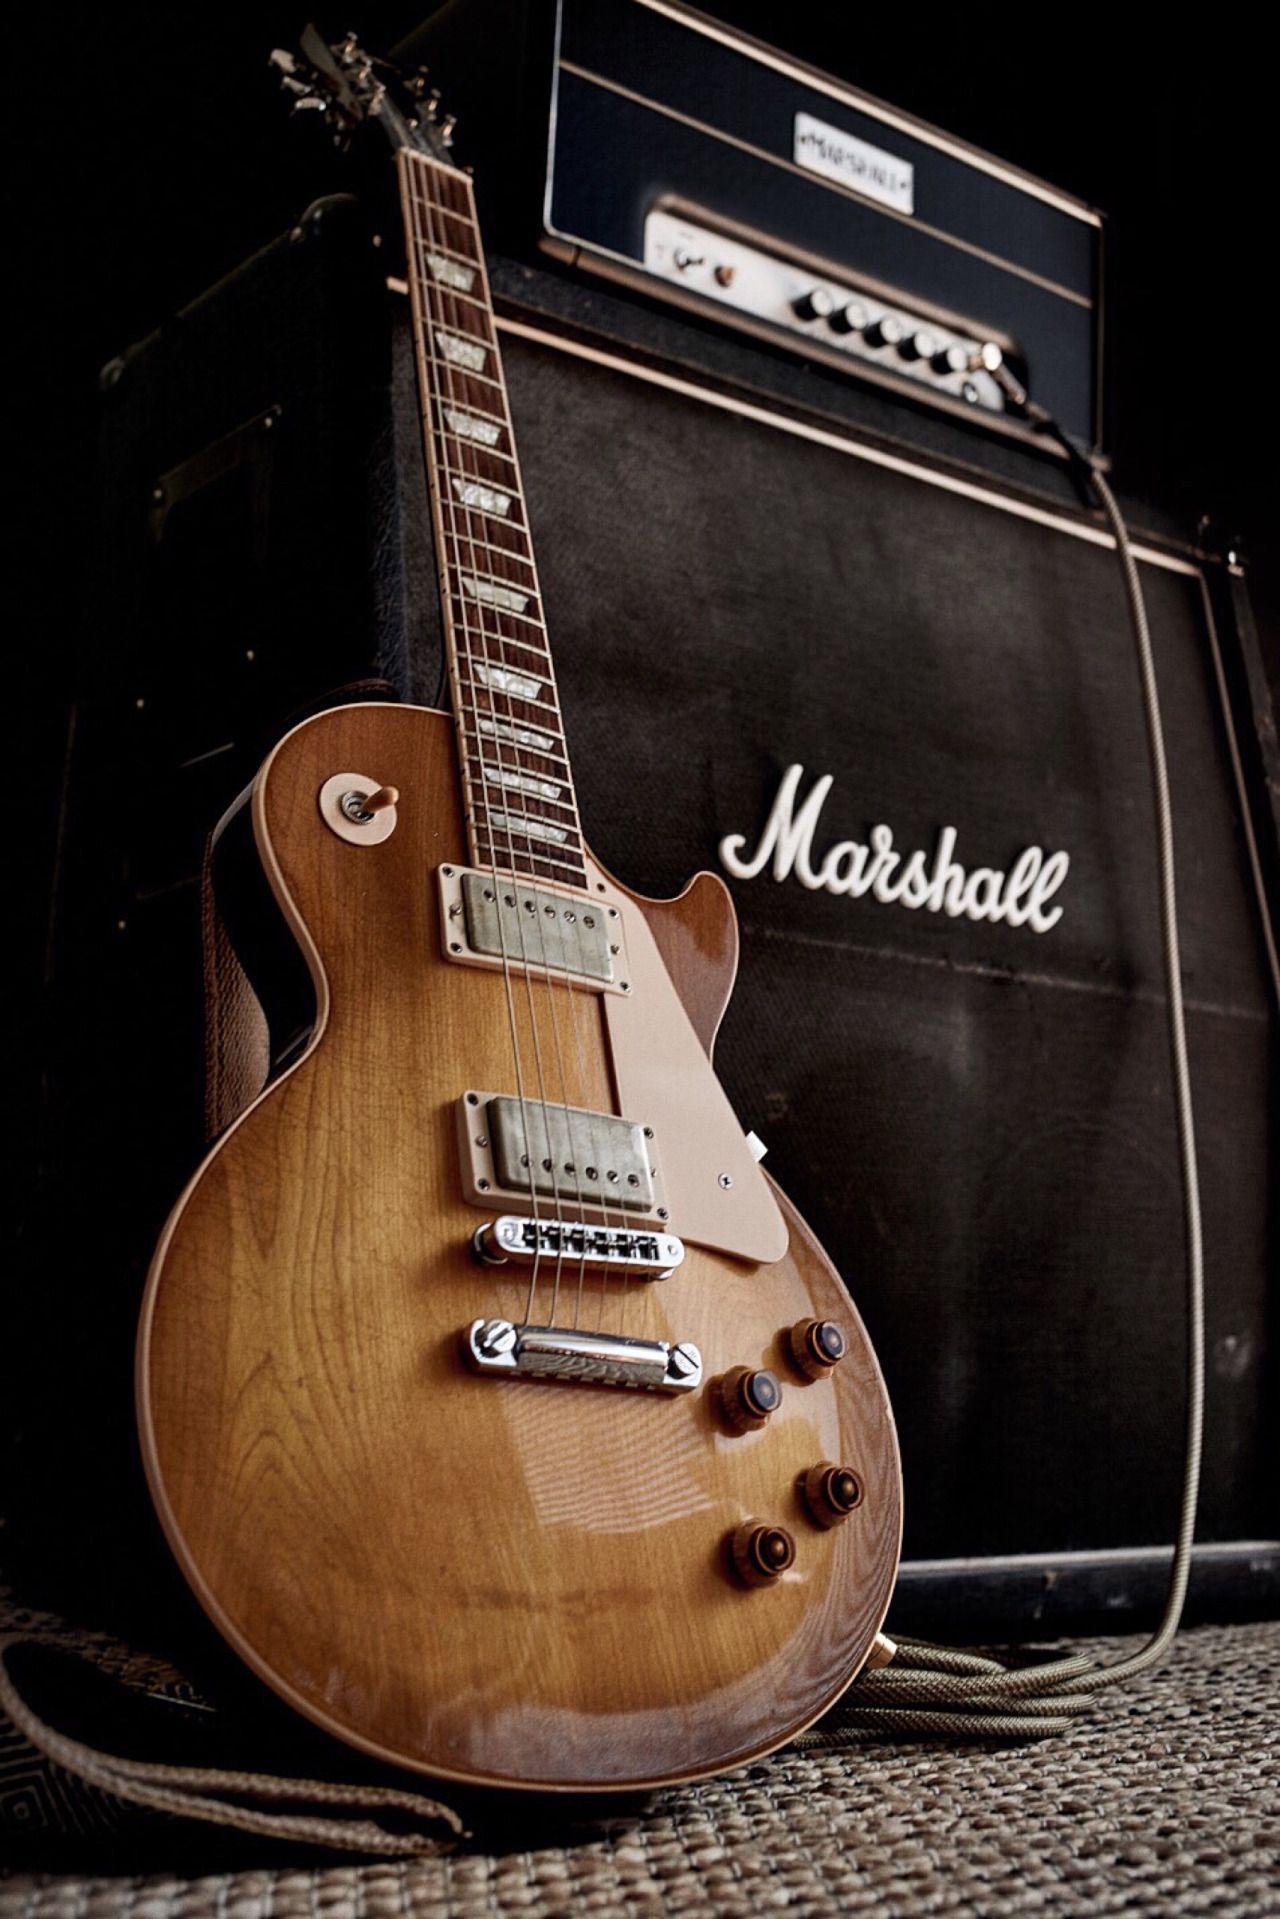 Guitarra Gibson Les Paul y amplificador Marshall - Fondo de pantalla